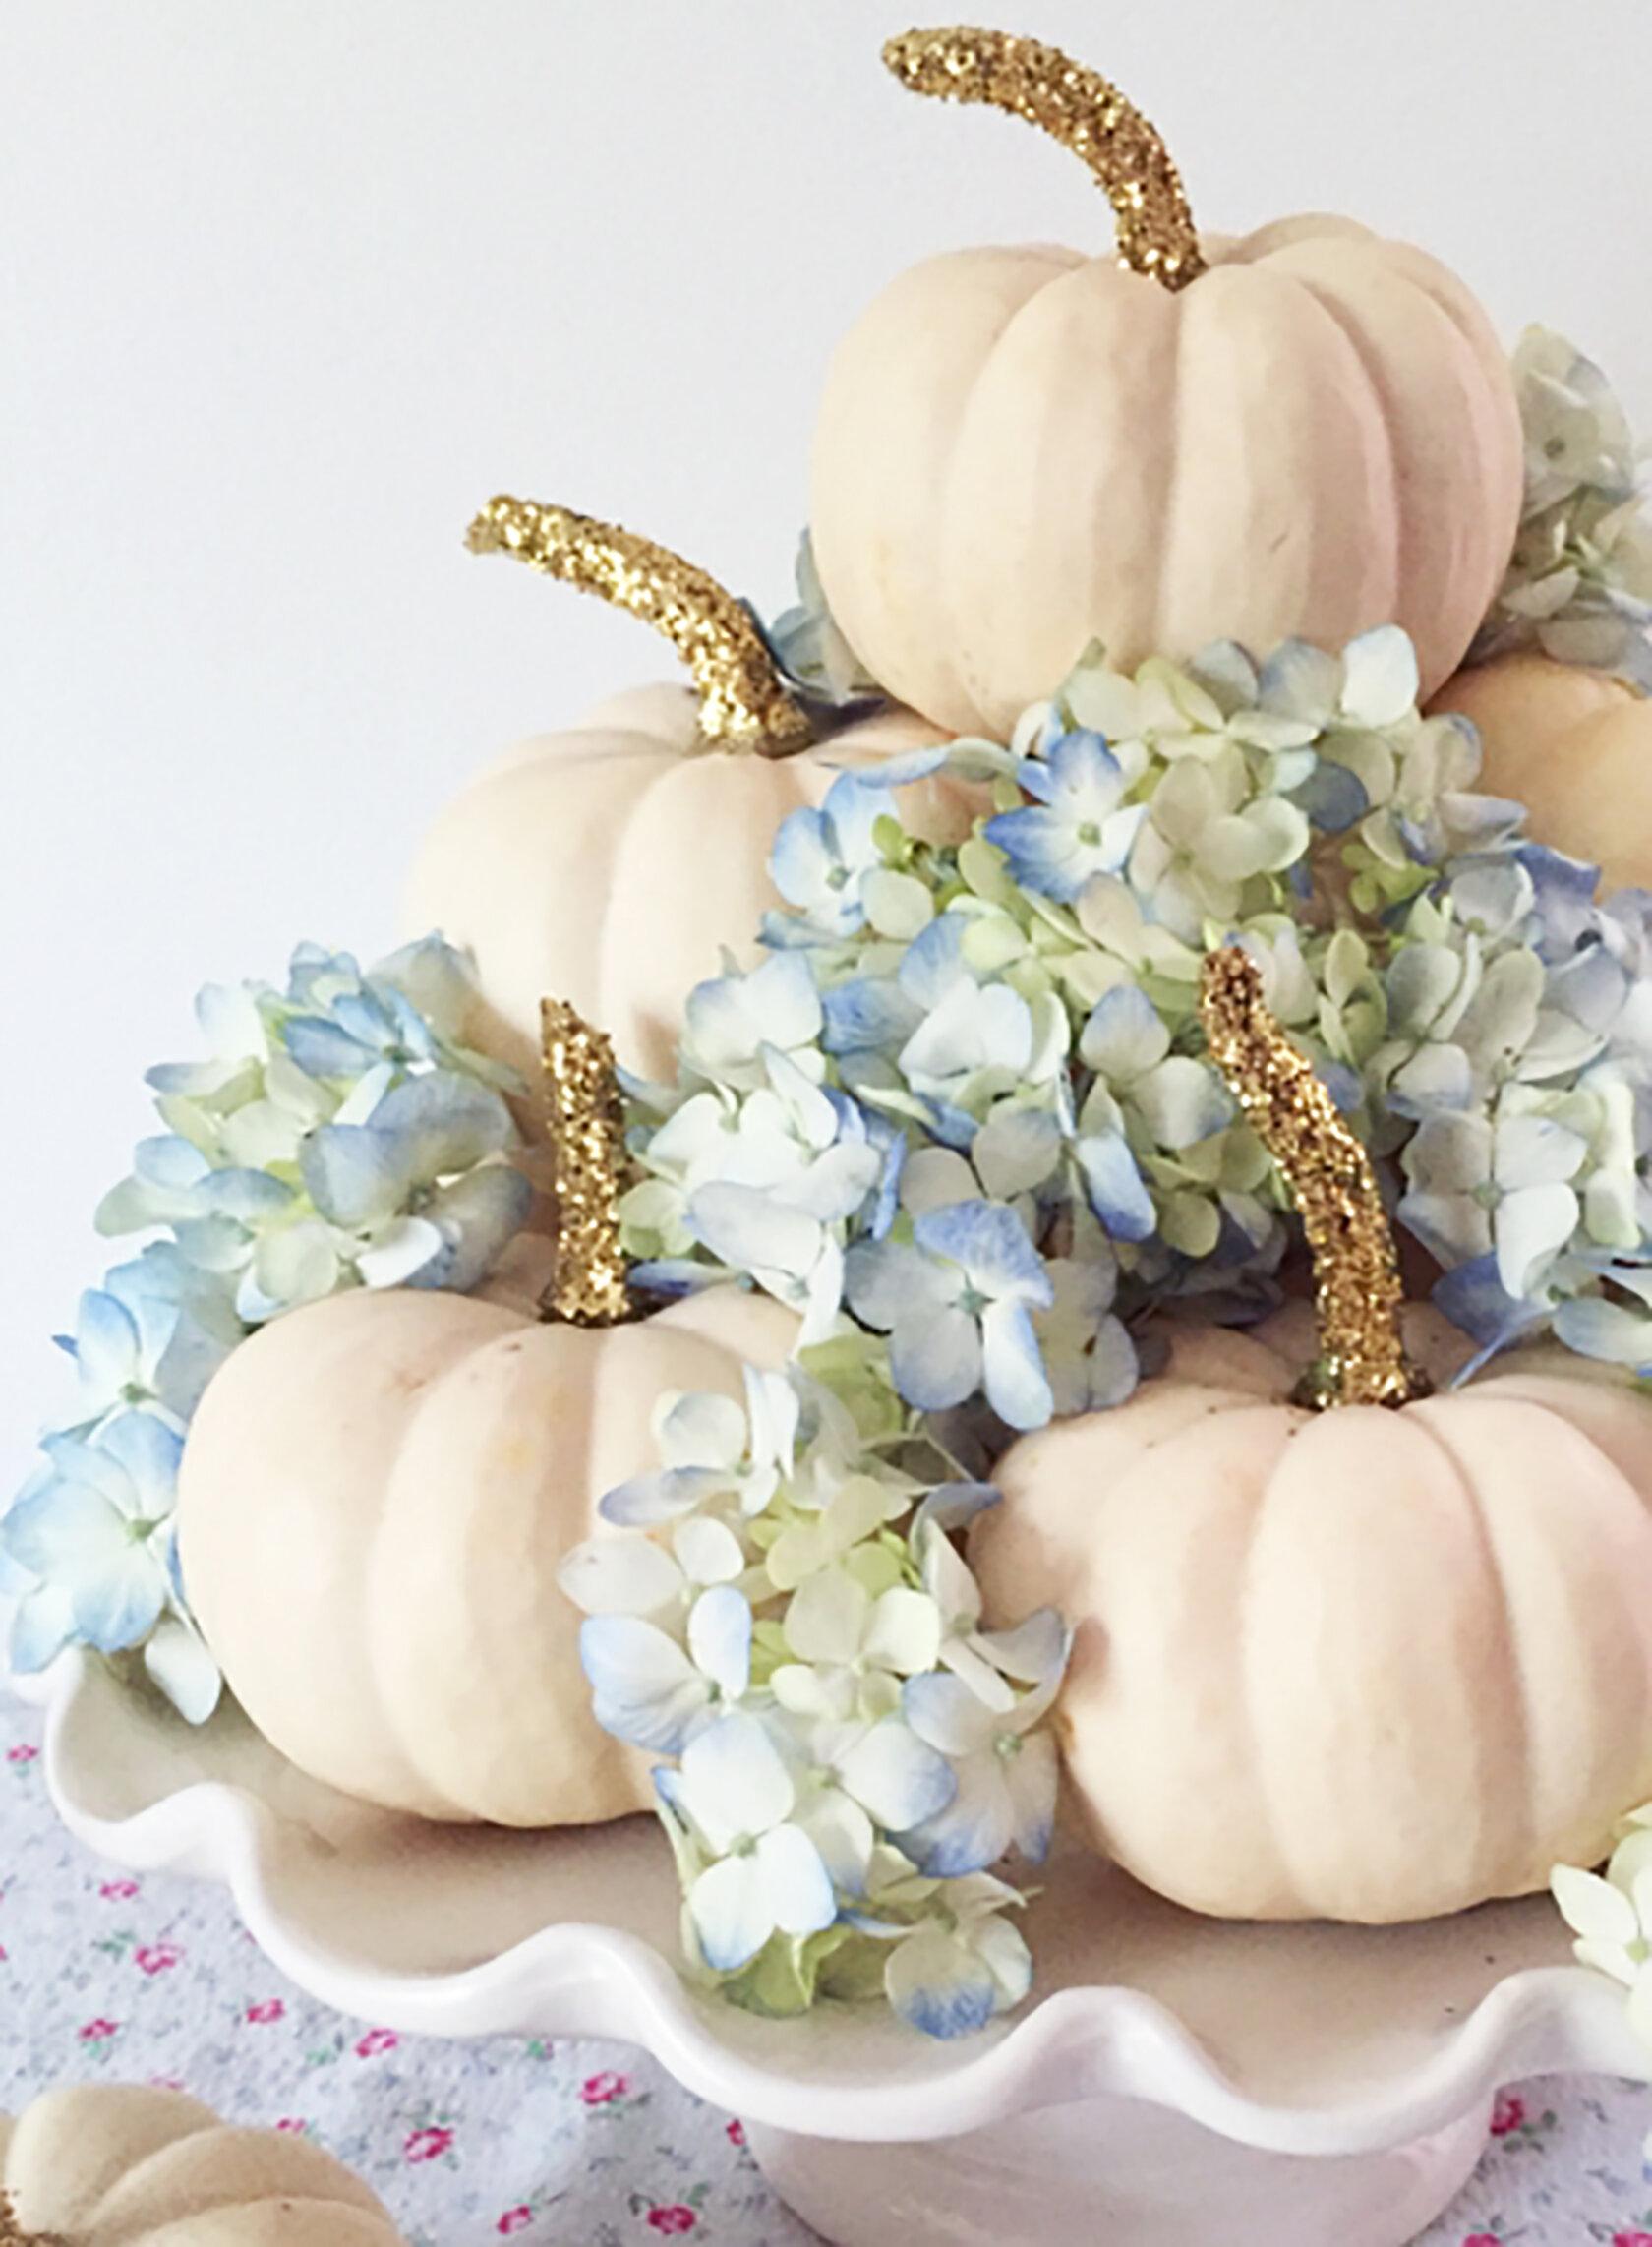 Sydne-Style-shares-no-carve-pumpkin-diy-ideas-for-fall-decor-halloween-with-glitter-white-pumpkins.jpg